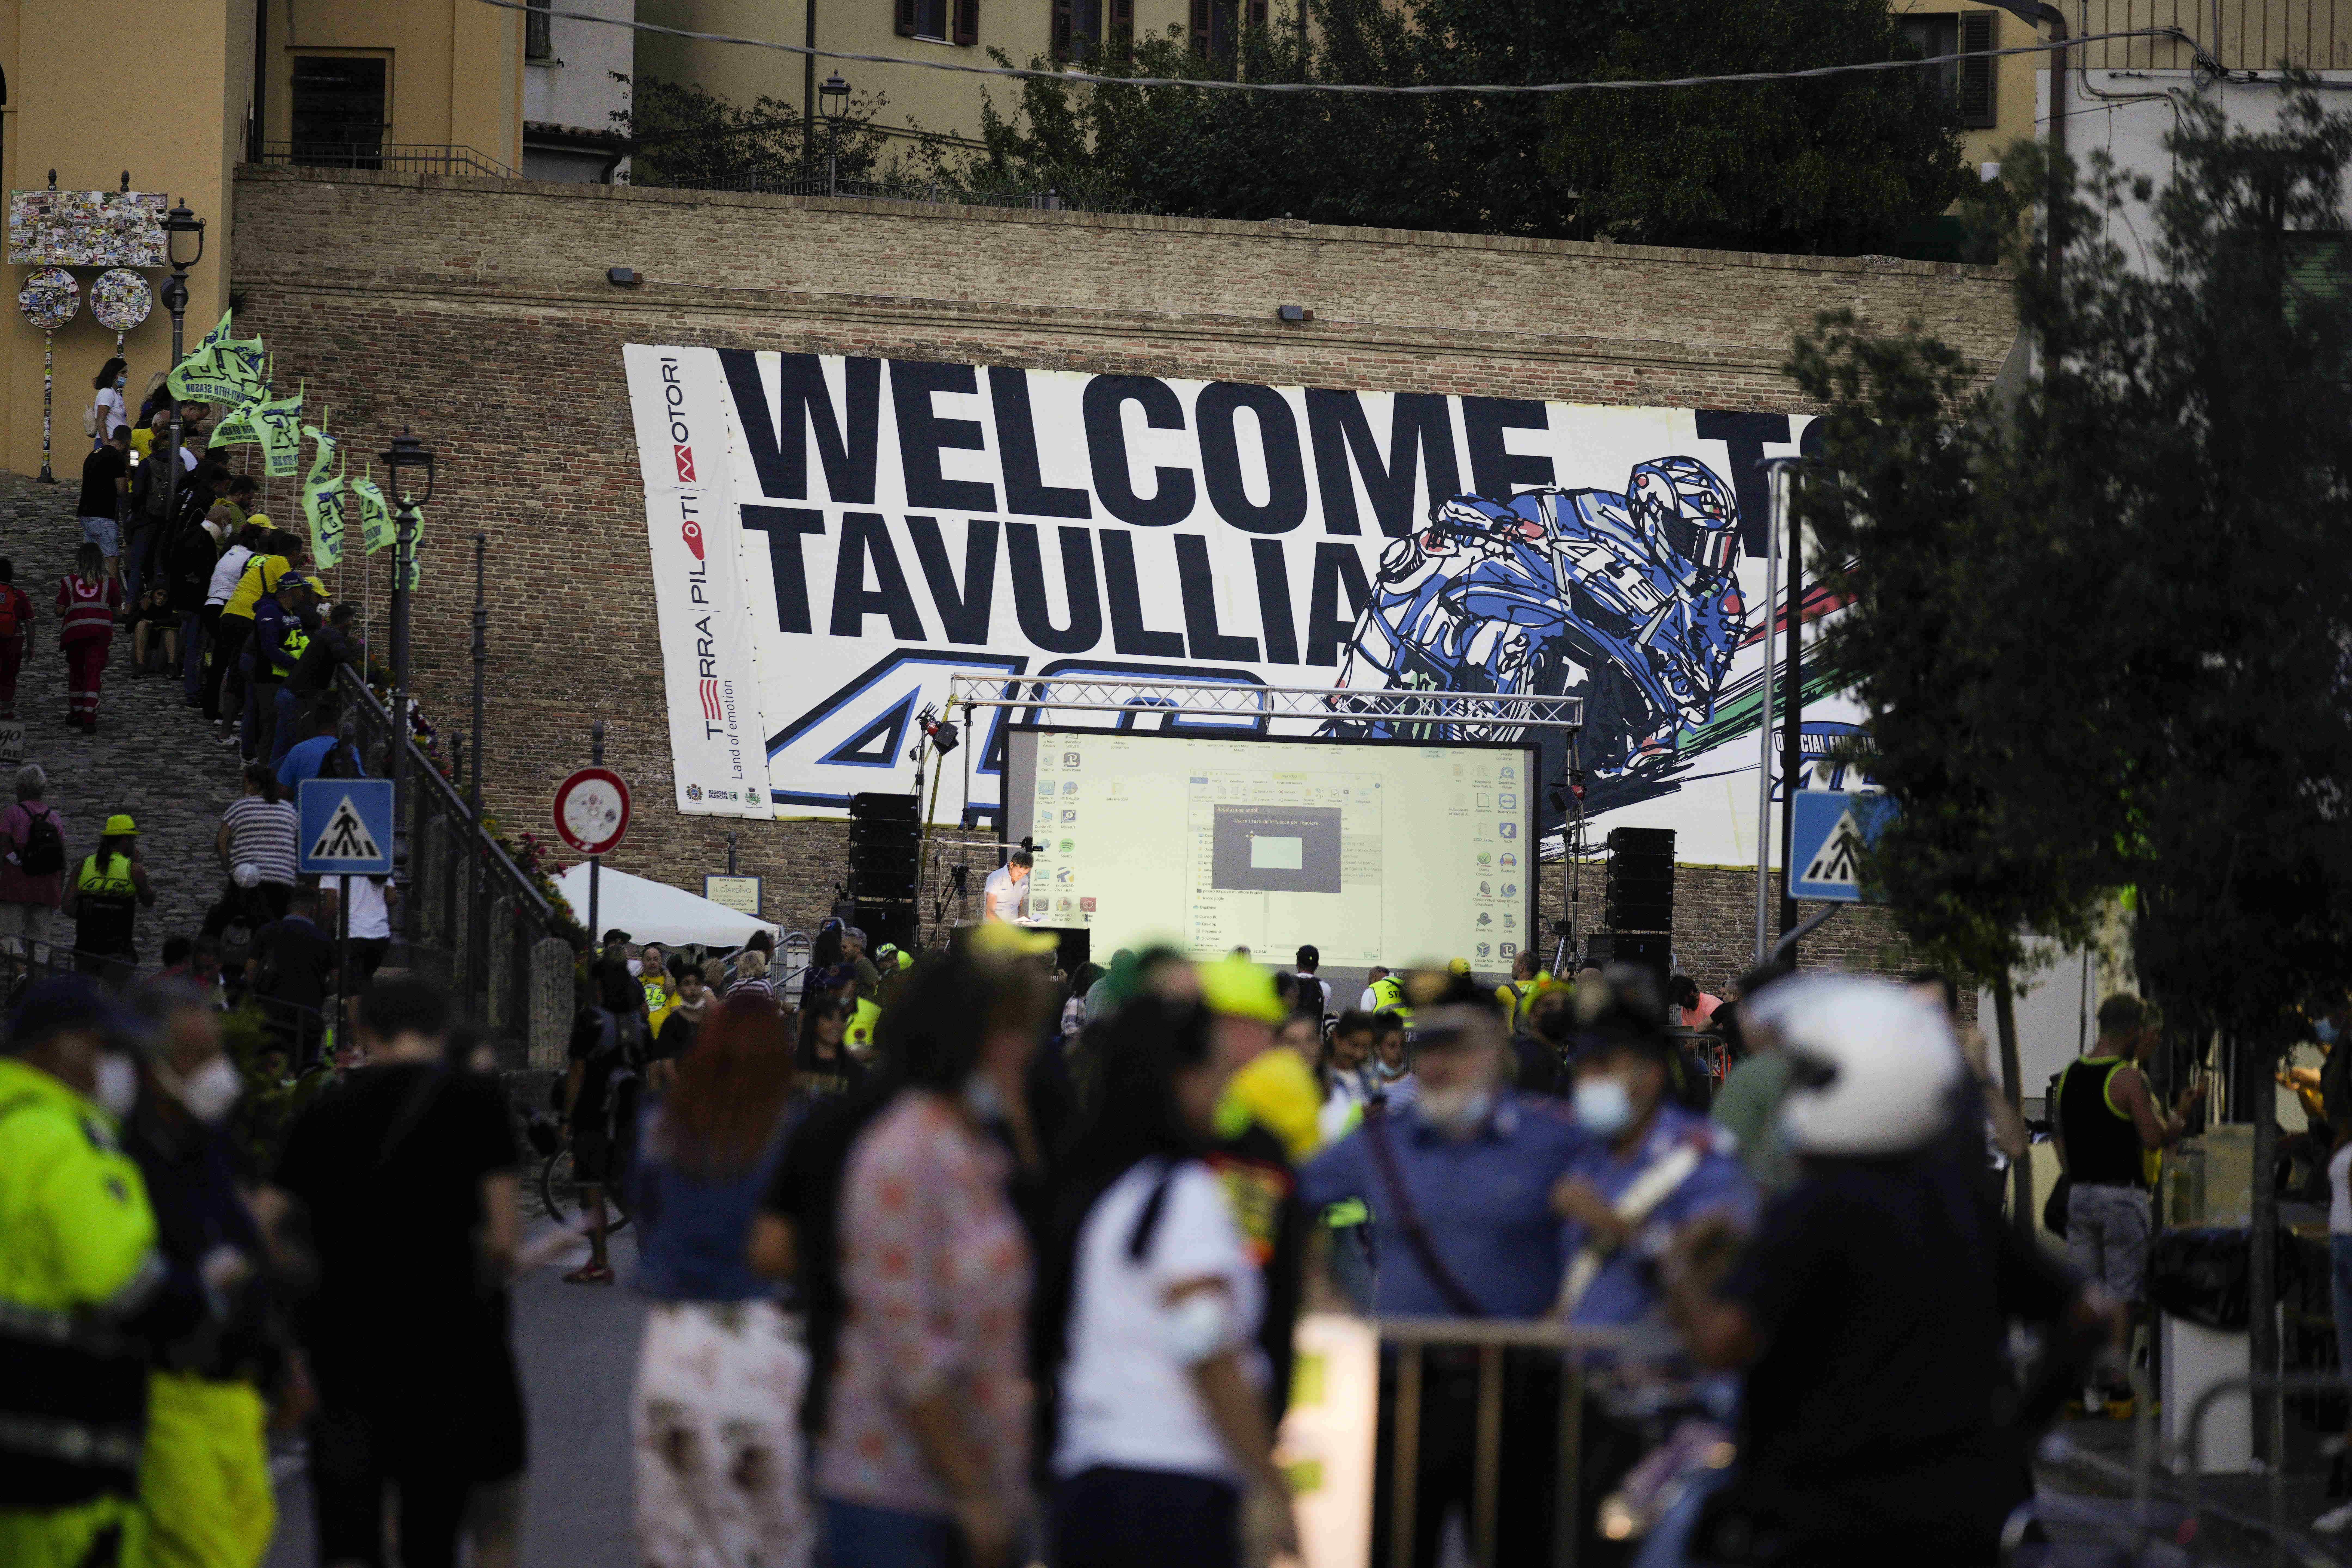 Tavullia se aferra a lo que queda de Valentino Rossi